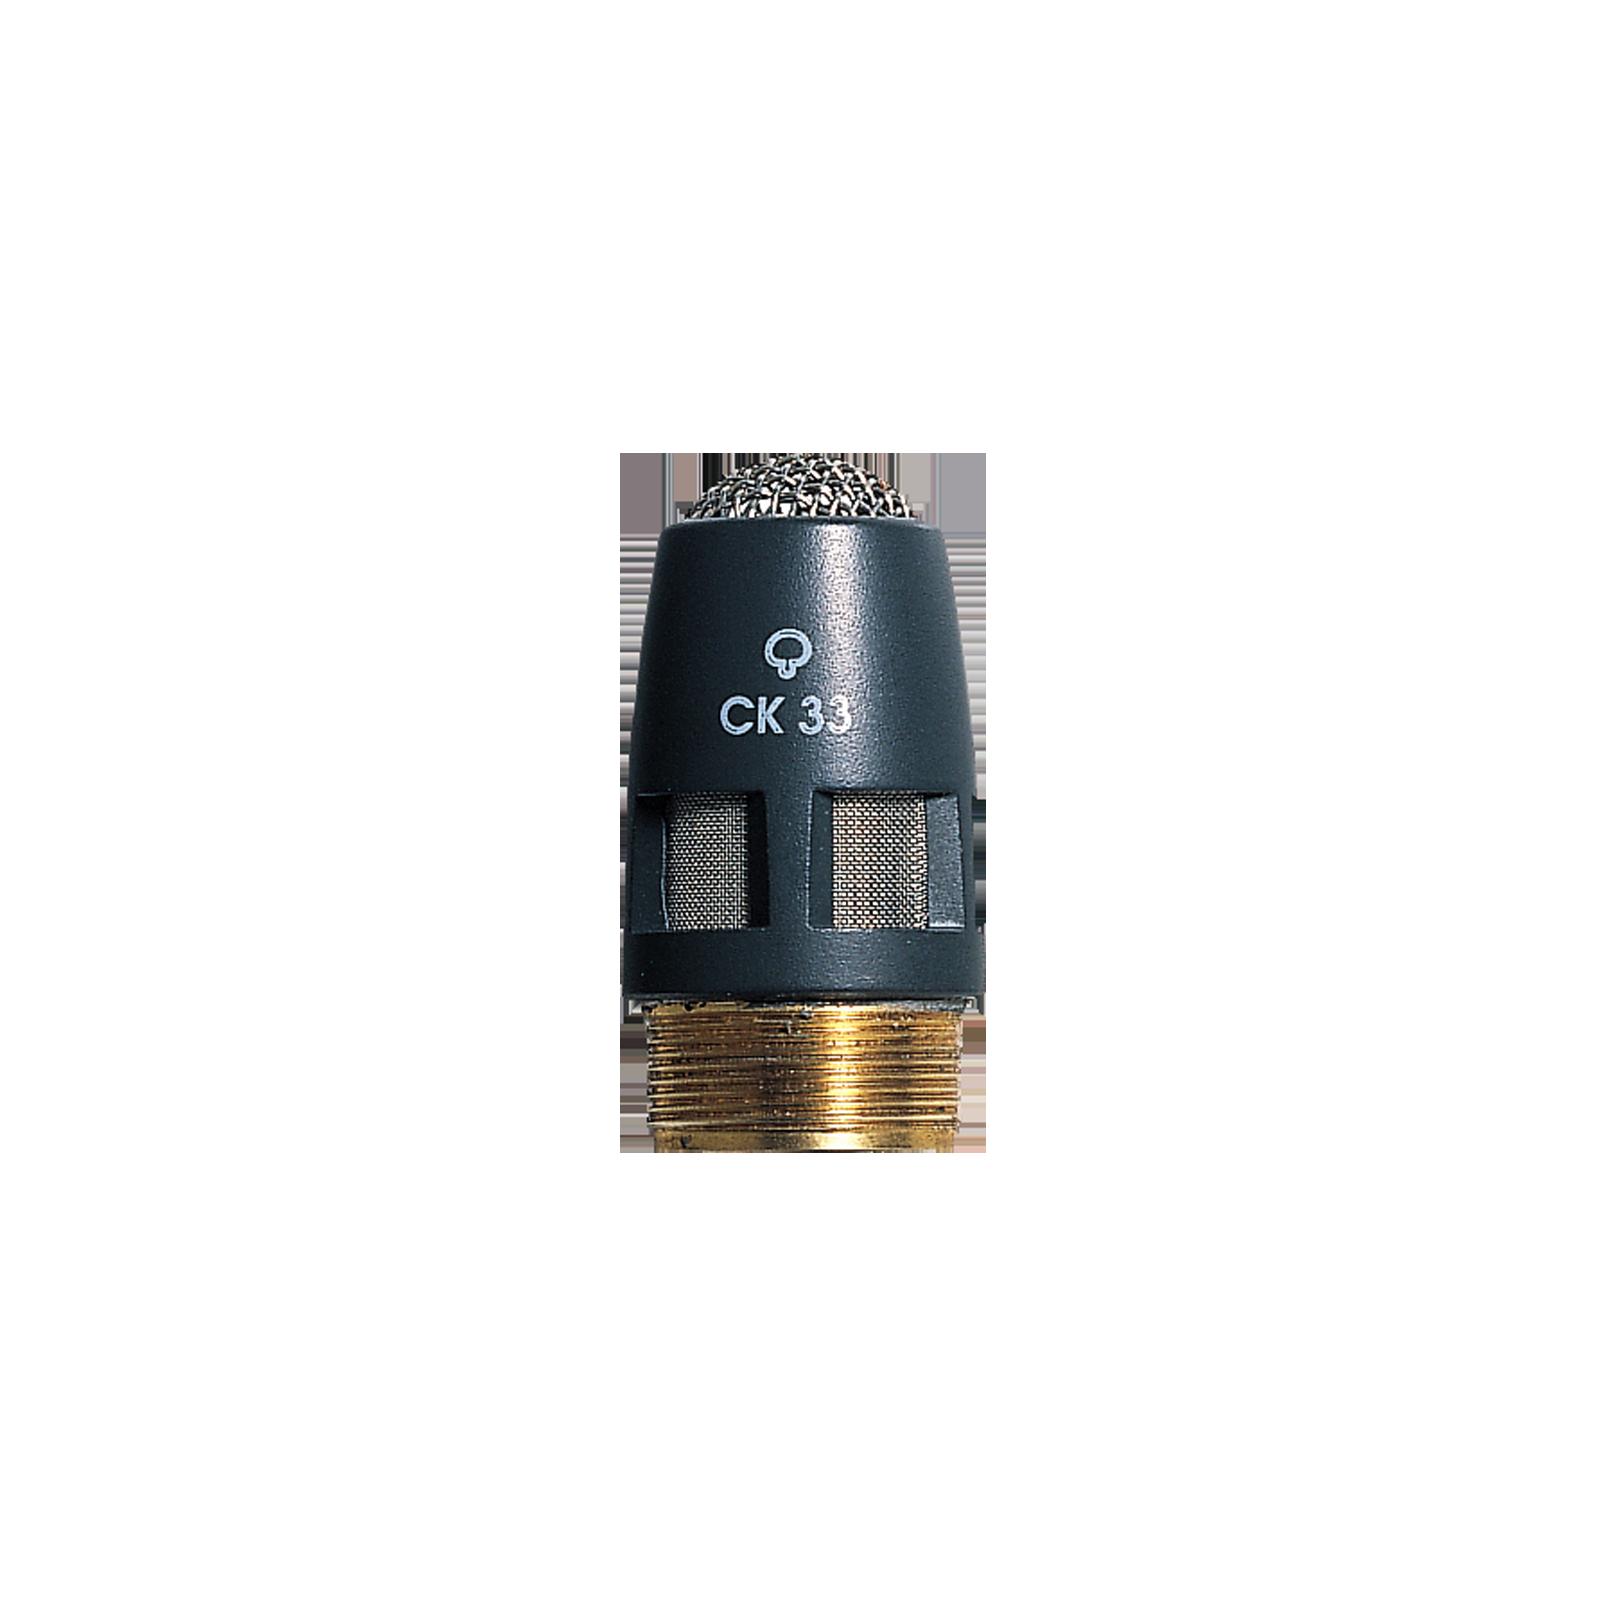 CK33 - Grey - High-performance hypercardioid condenser microphone capsule - DAM Series - Hero